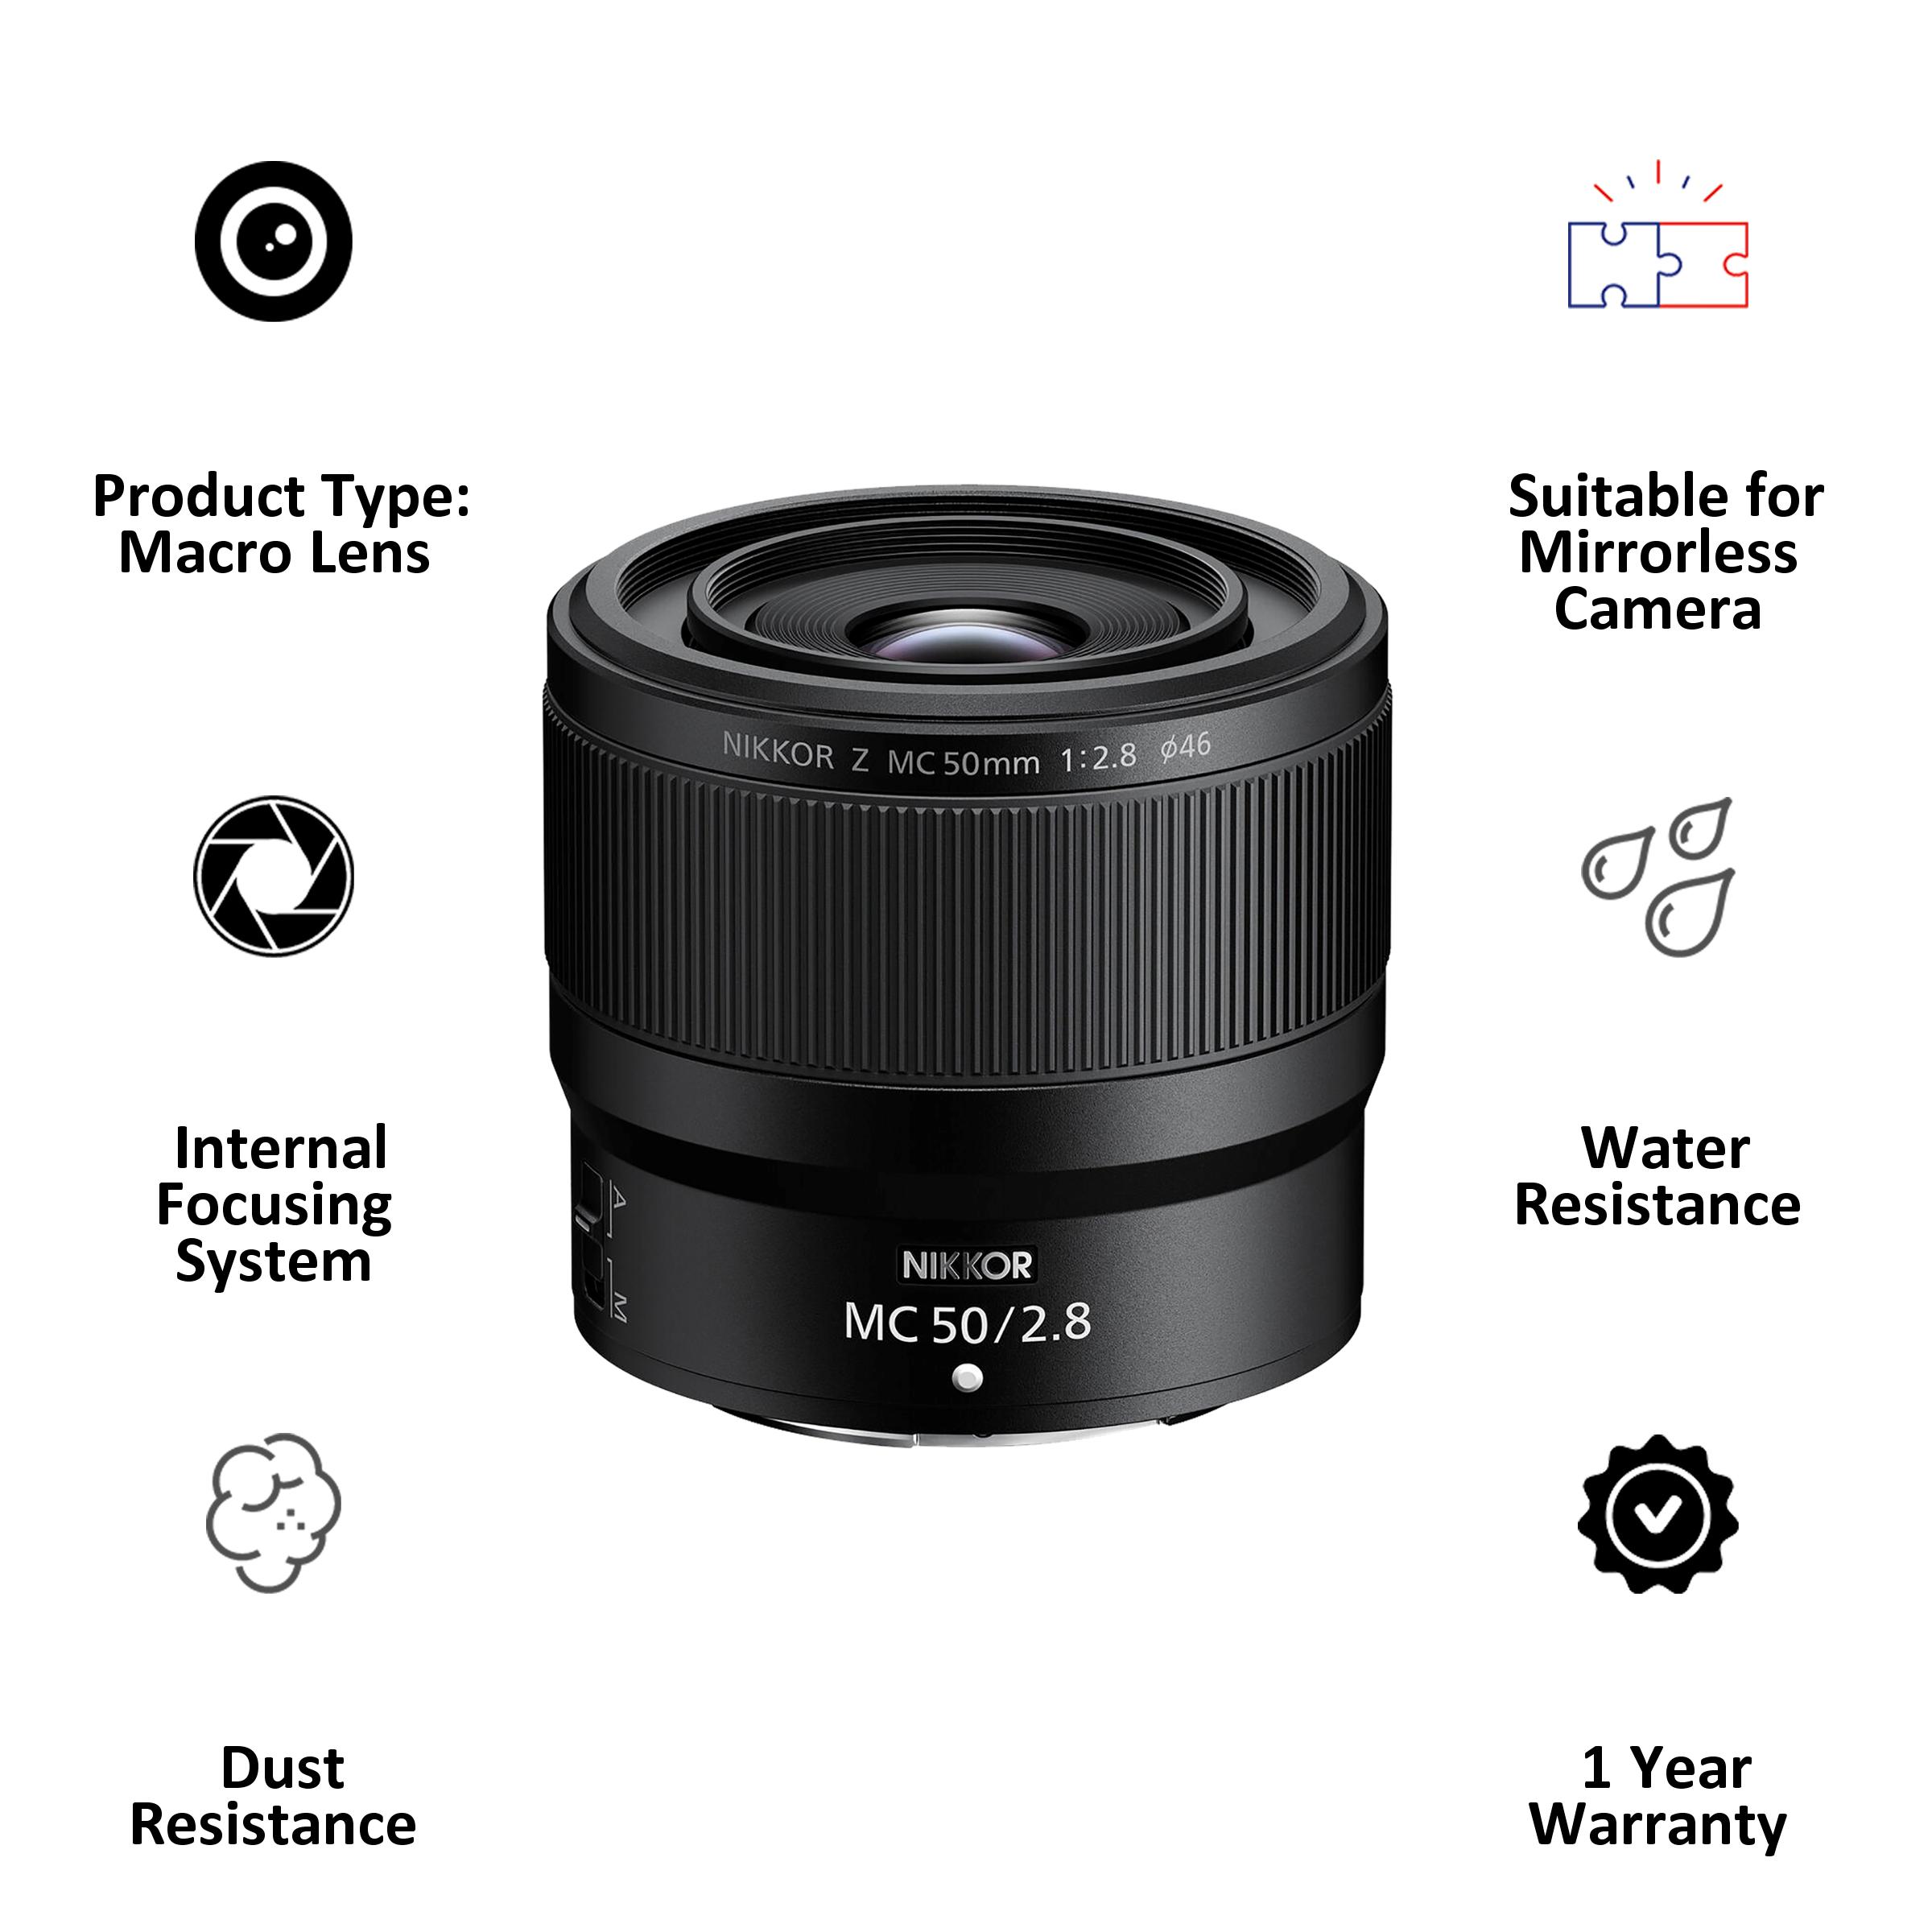 Lens - Nikon Nikkor Z MC 50mm f/2.850 mm F22-F2.8 Macro Lens (1:1 Magnification, JMA603DA, Black)_3